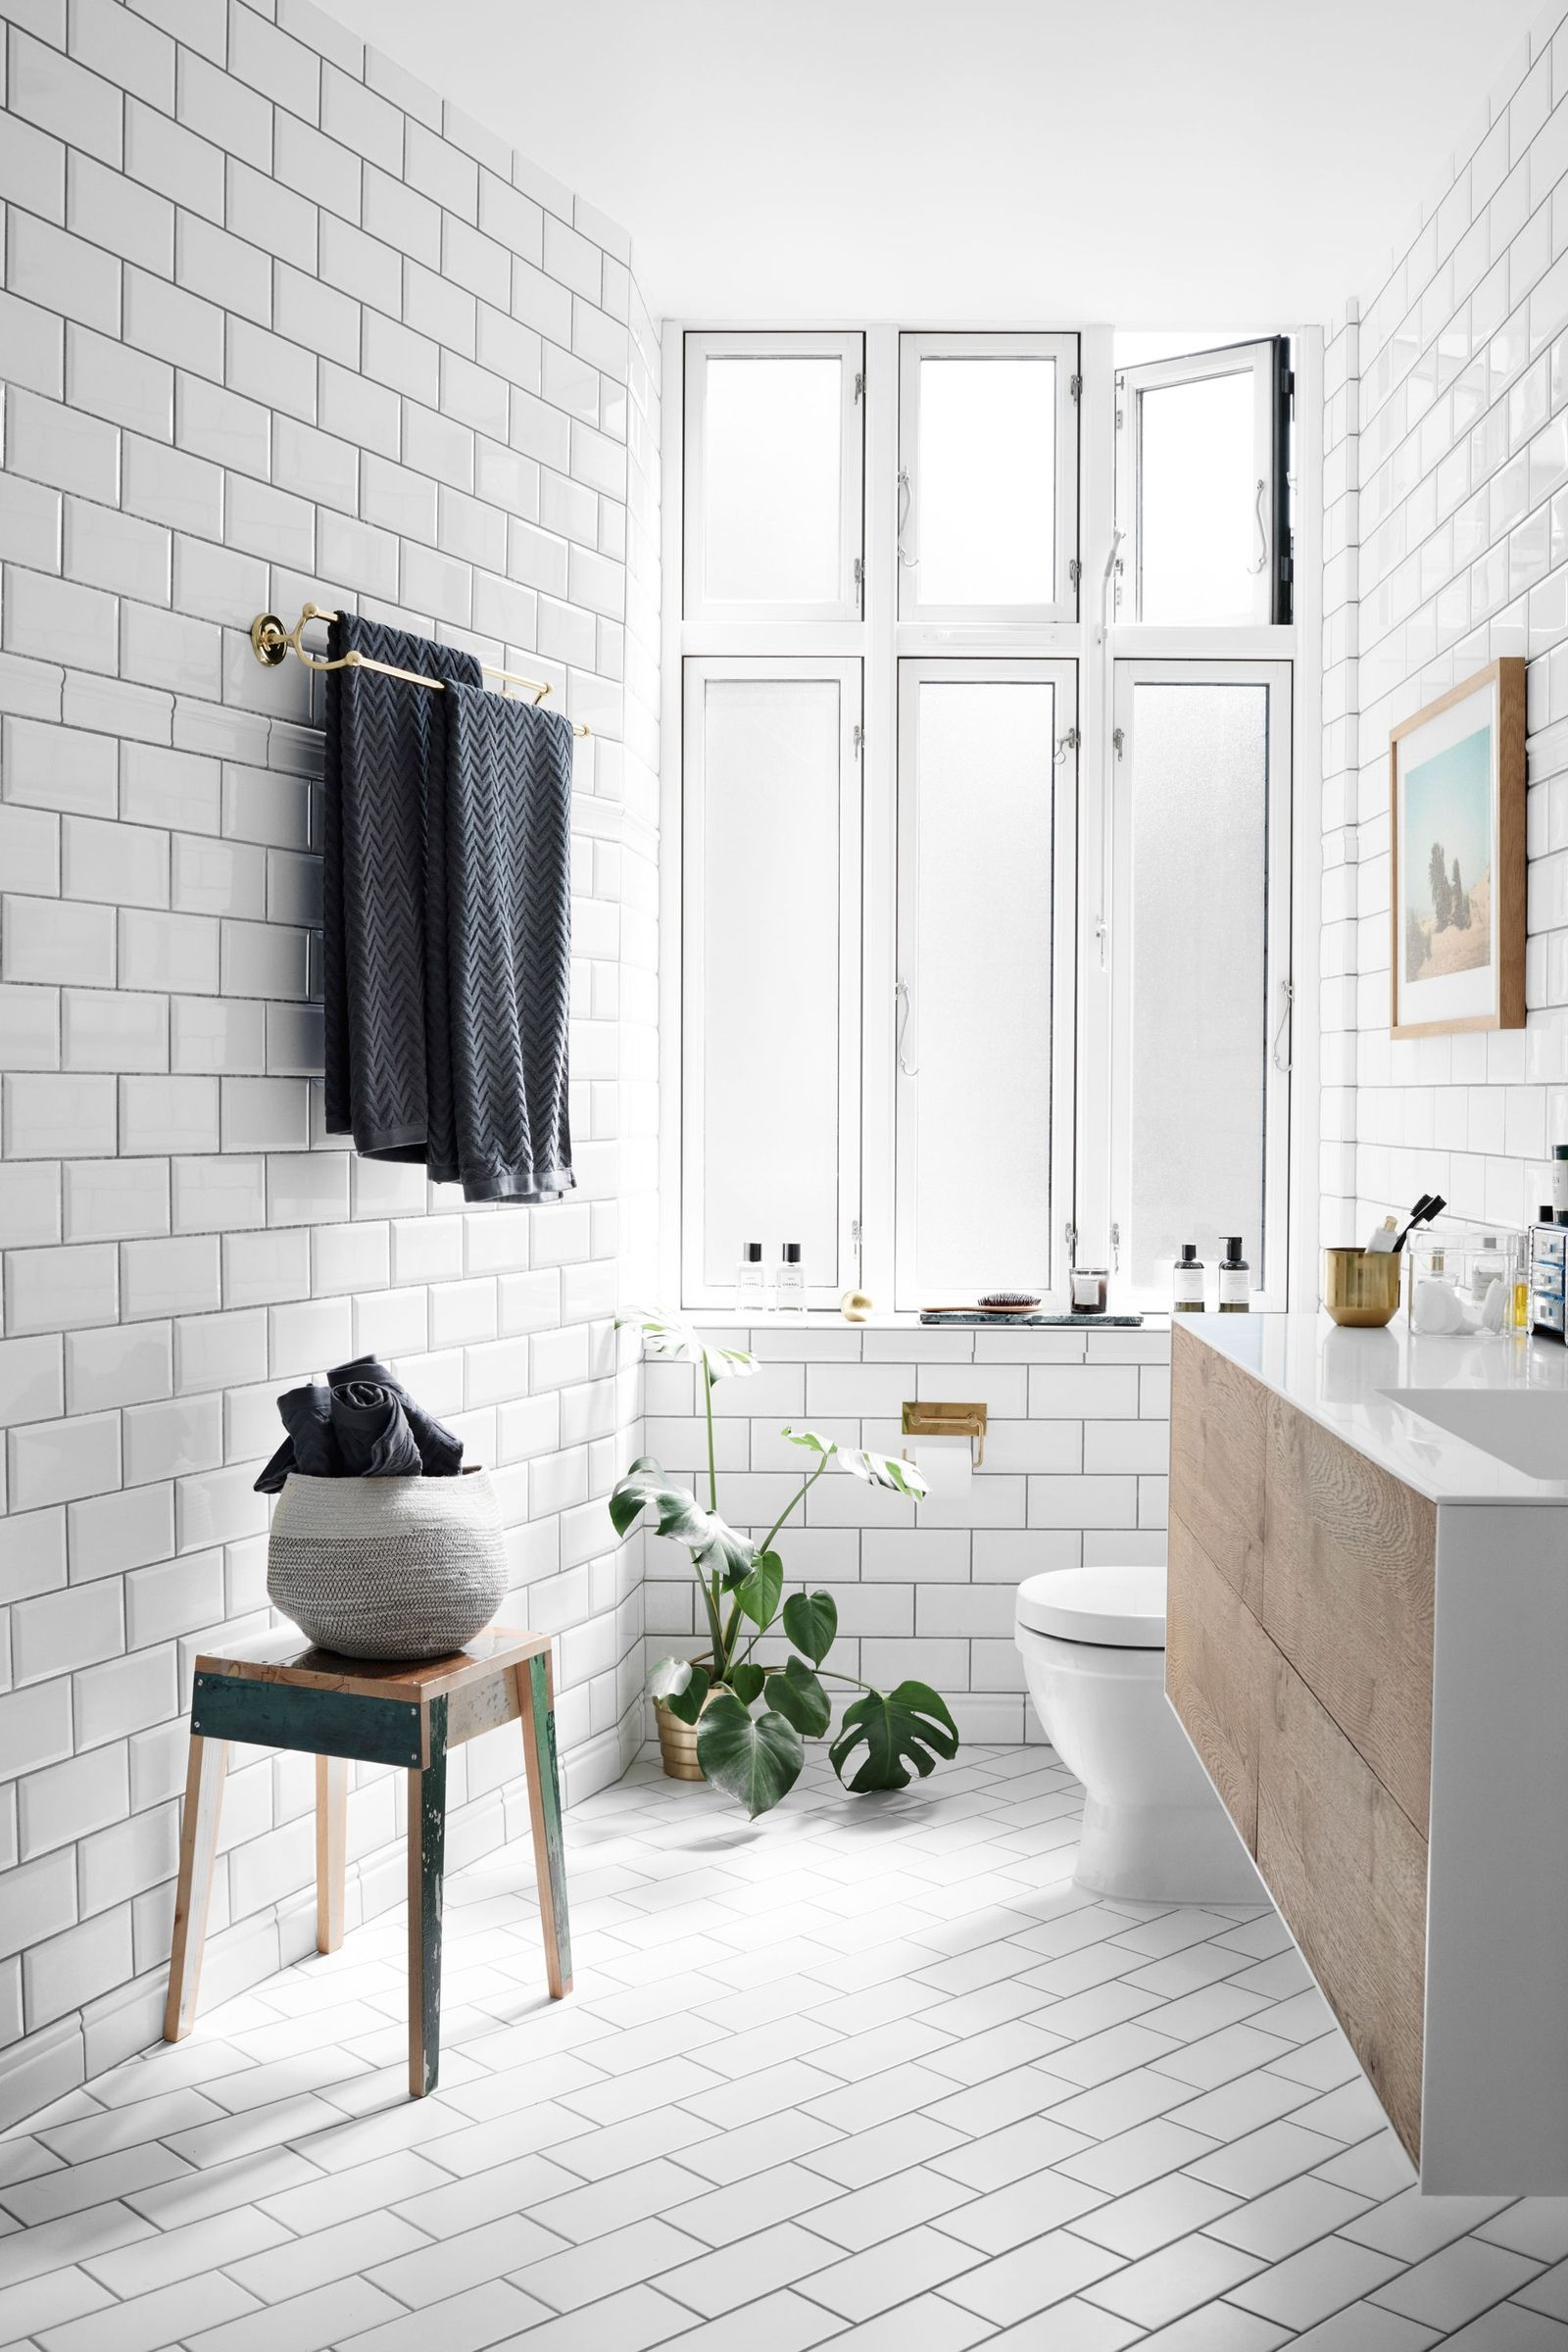 exclusive: inside it-girl pernille teisbaek's new home in copenhagen